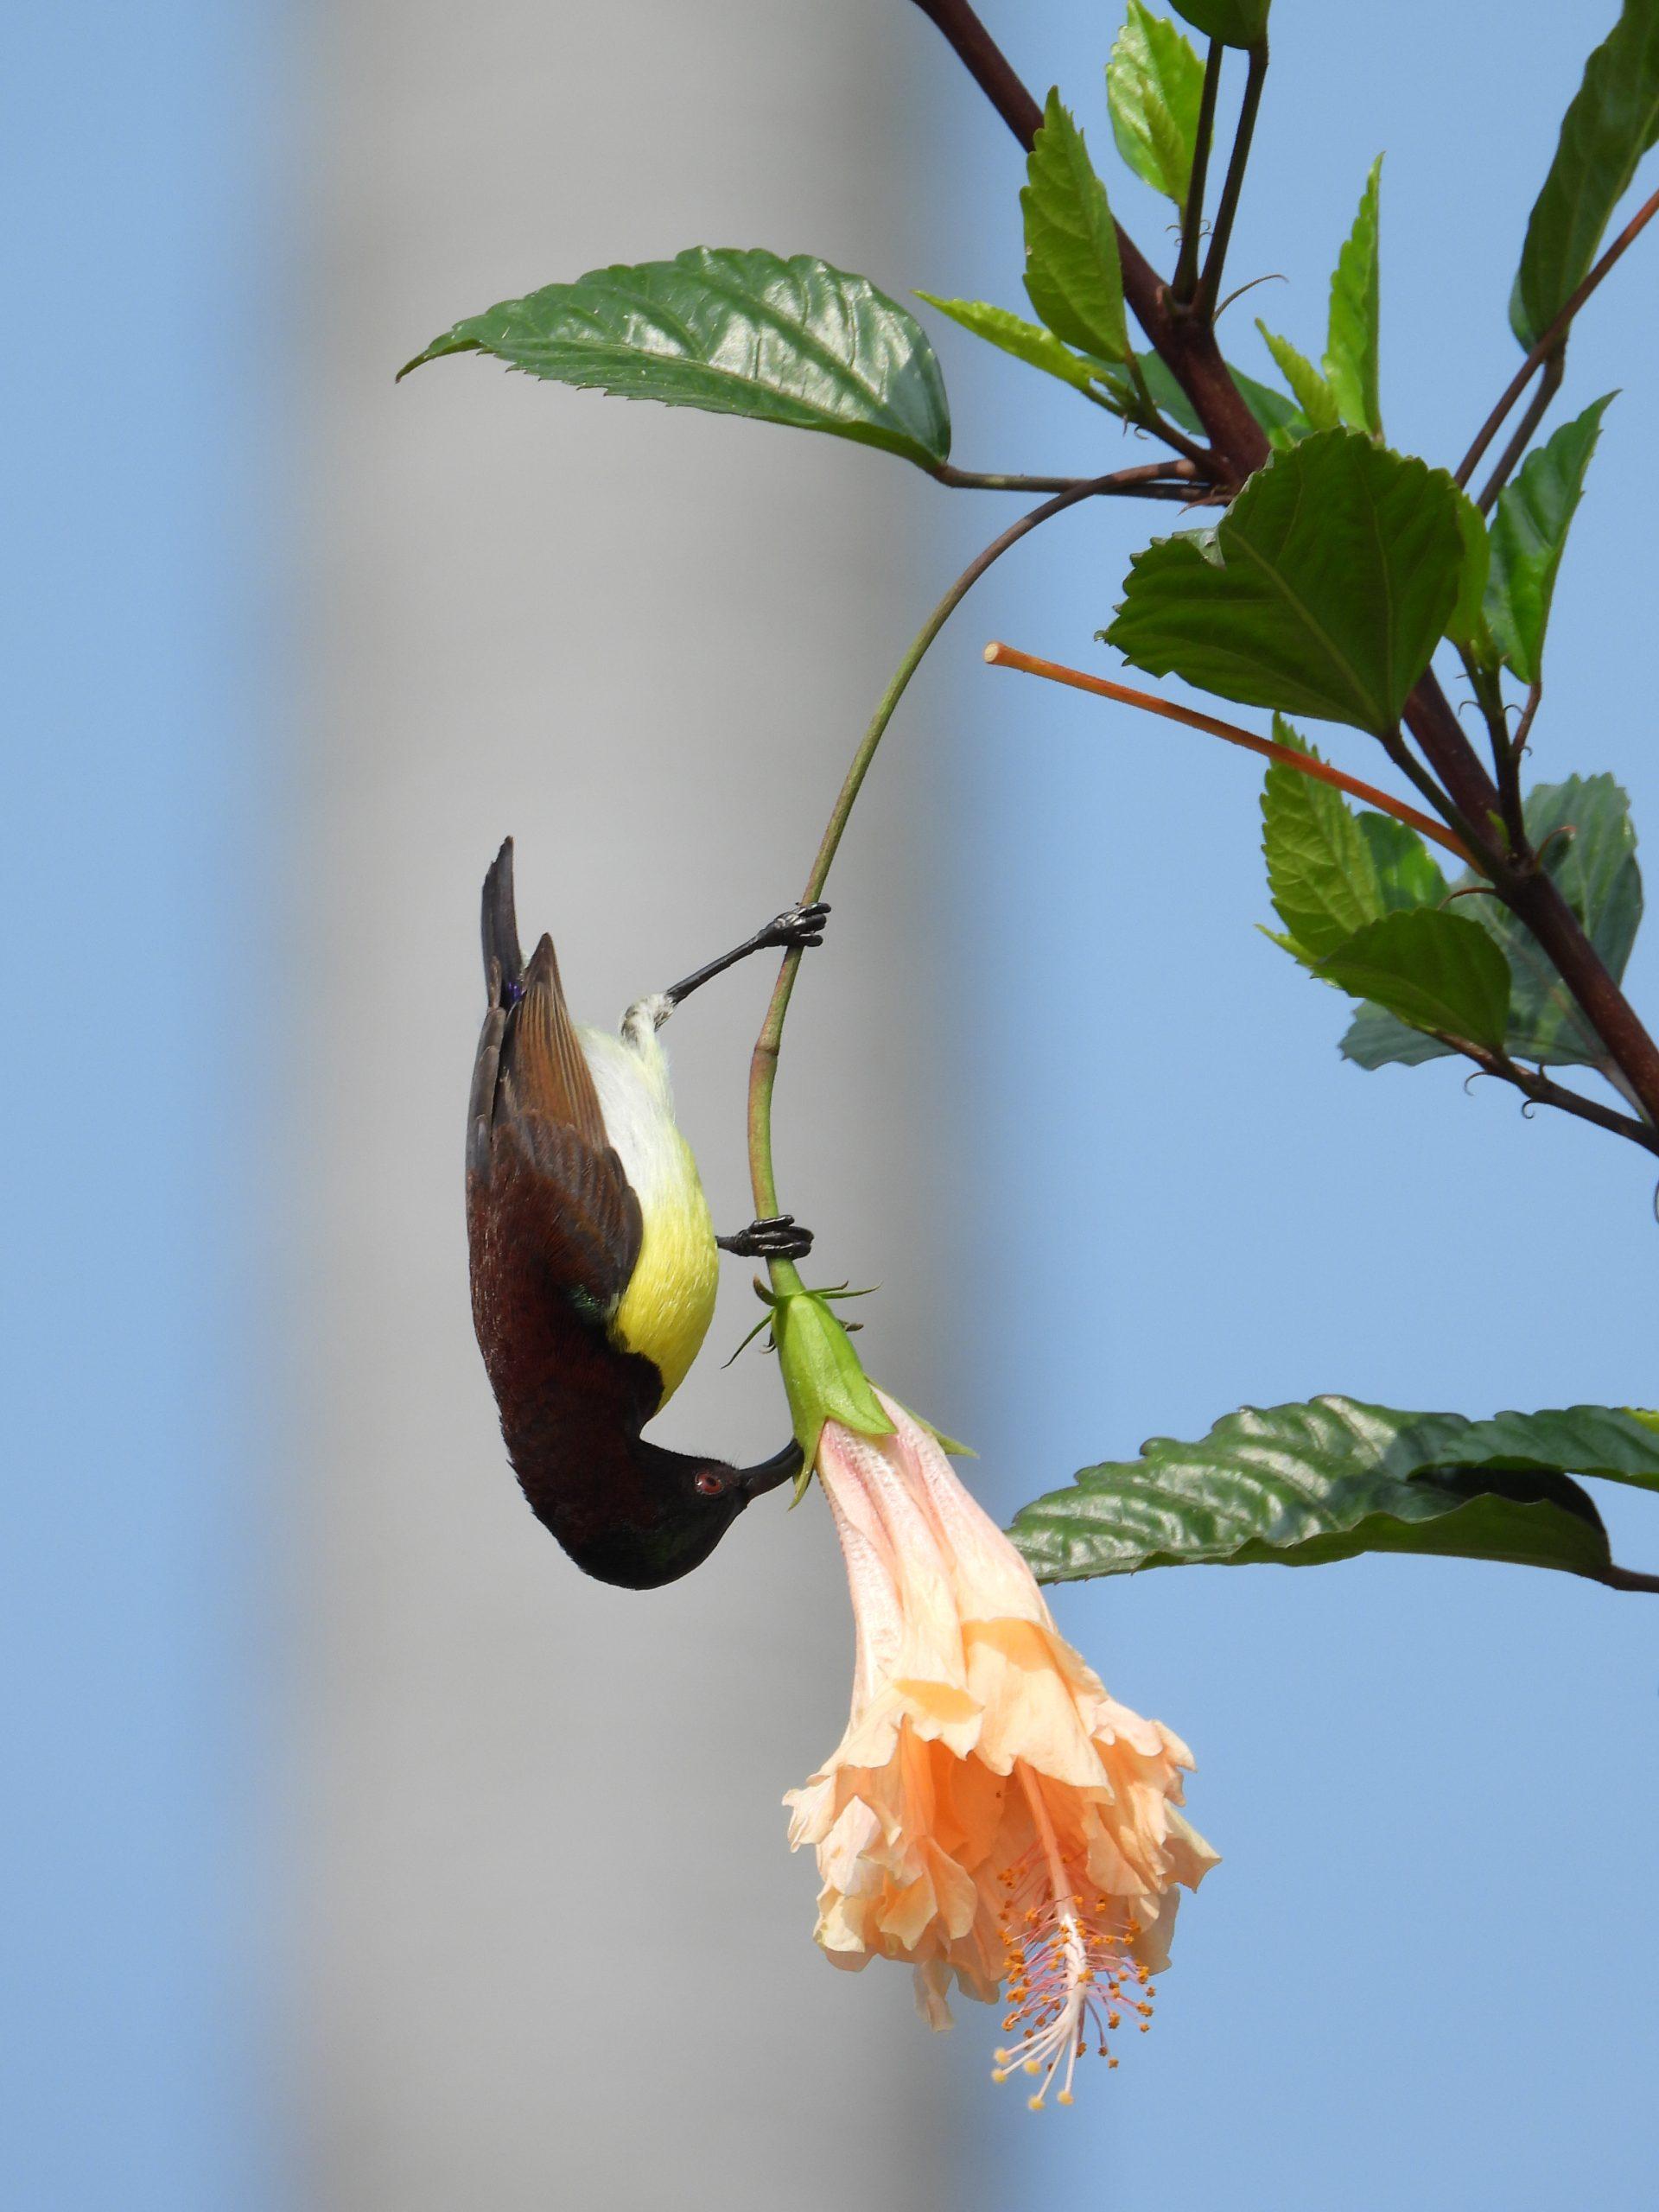 Hummingbird on a flower